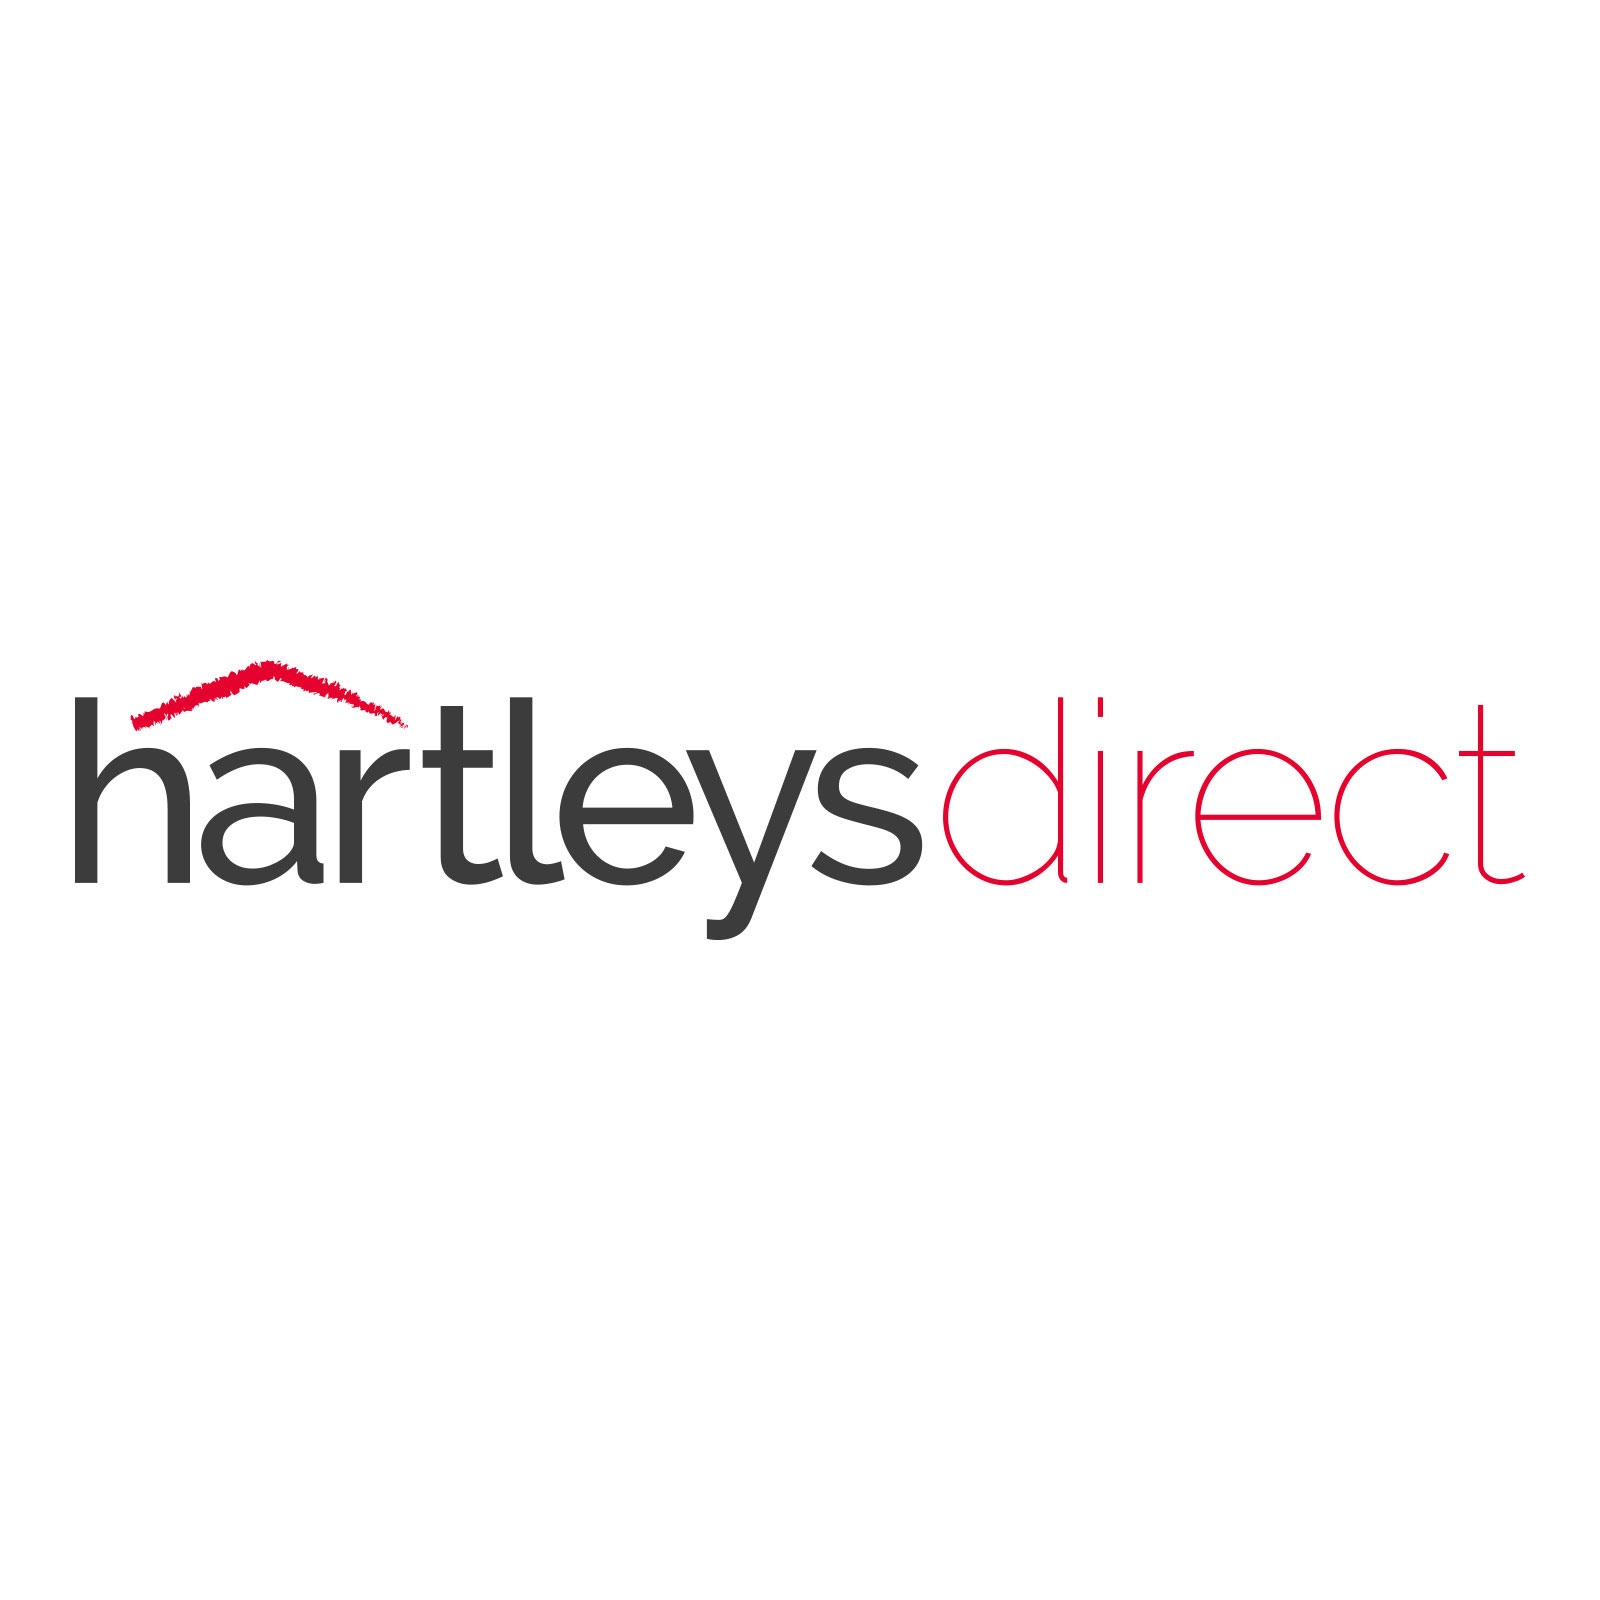 Hartleys-2-Drawer-Grey-Retro-Bedside-Table-on-White-Background.jpg